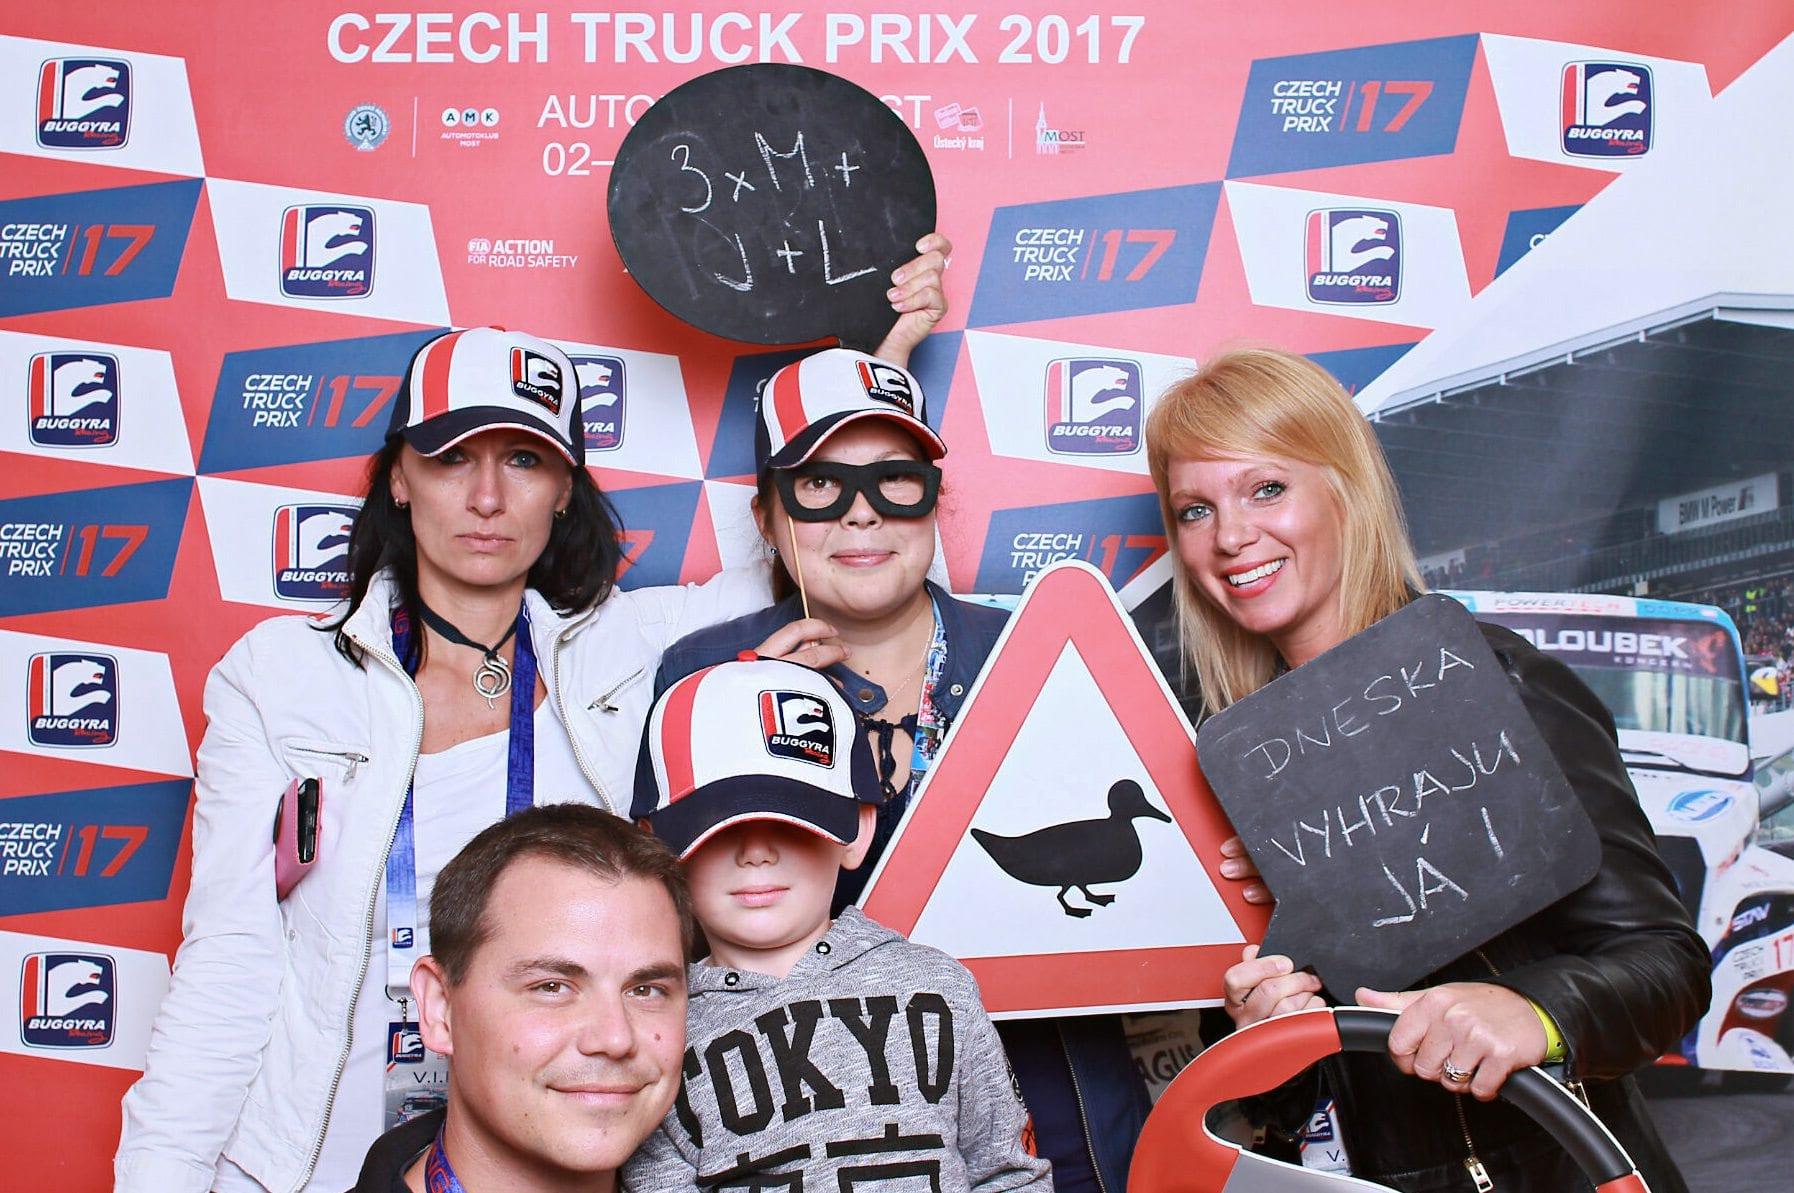 fotokoutek-czech-truck-prix-2017-sobota-303068